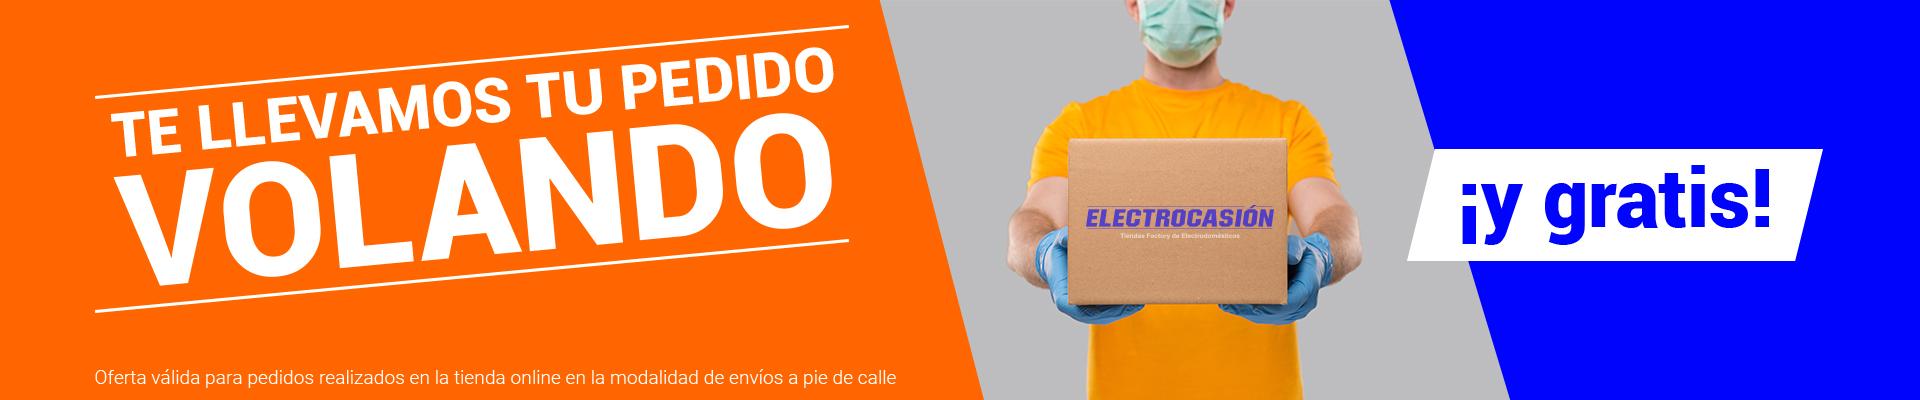 Electrocasión